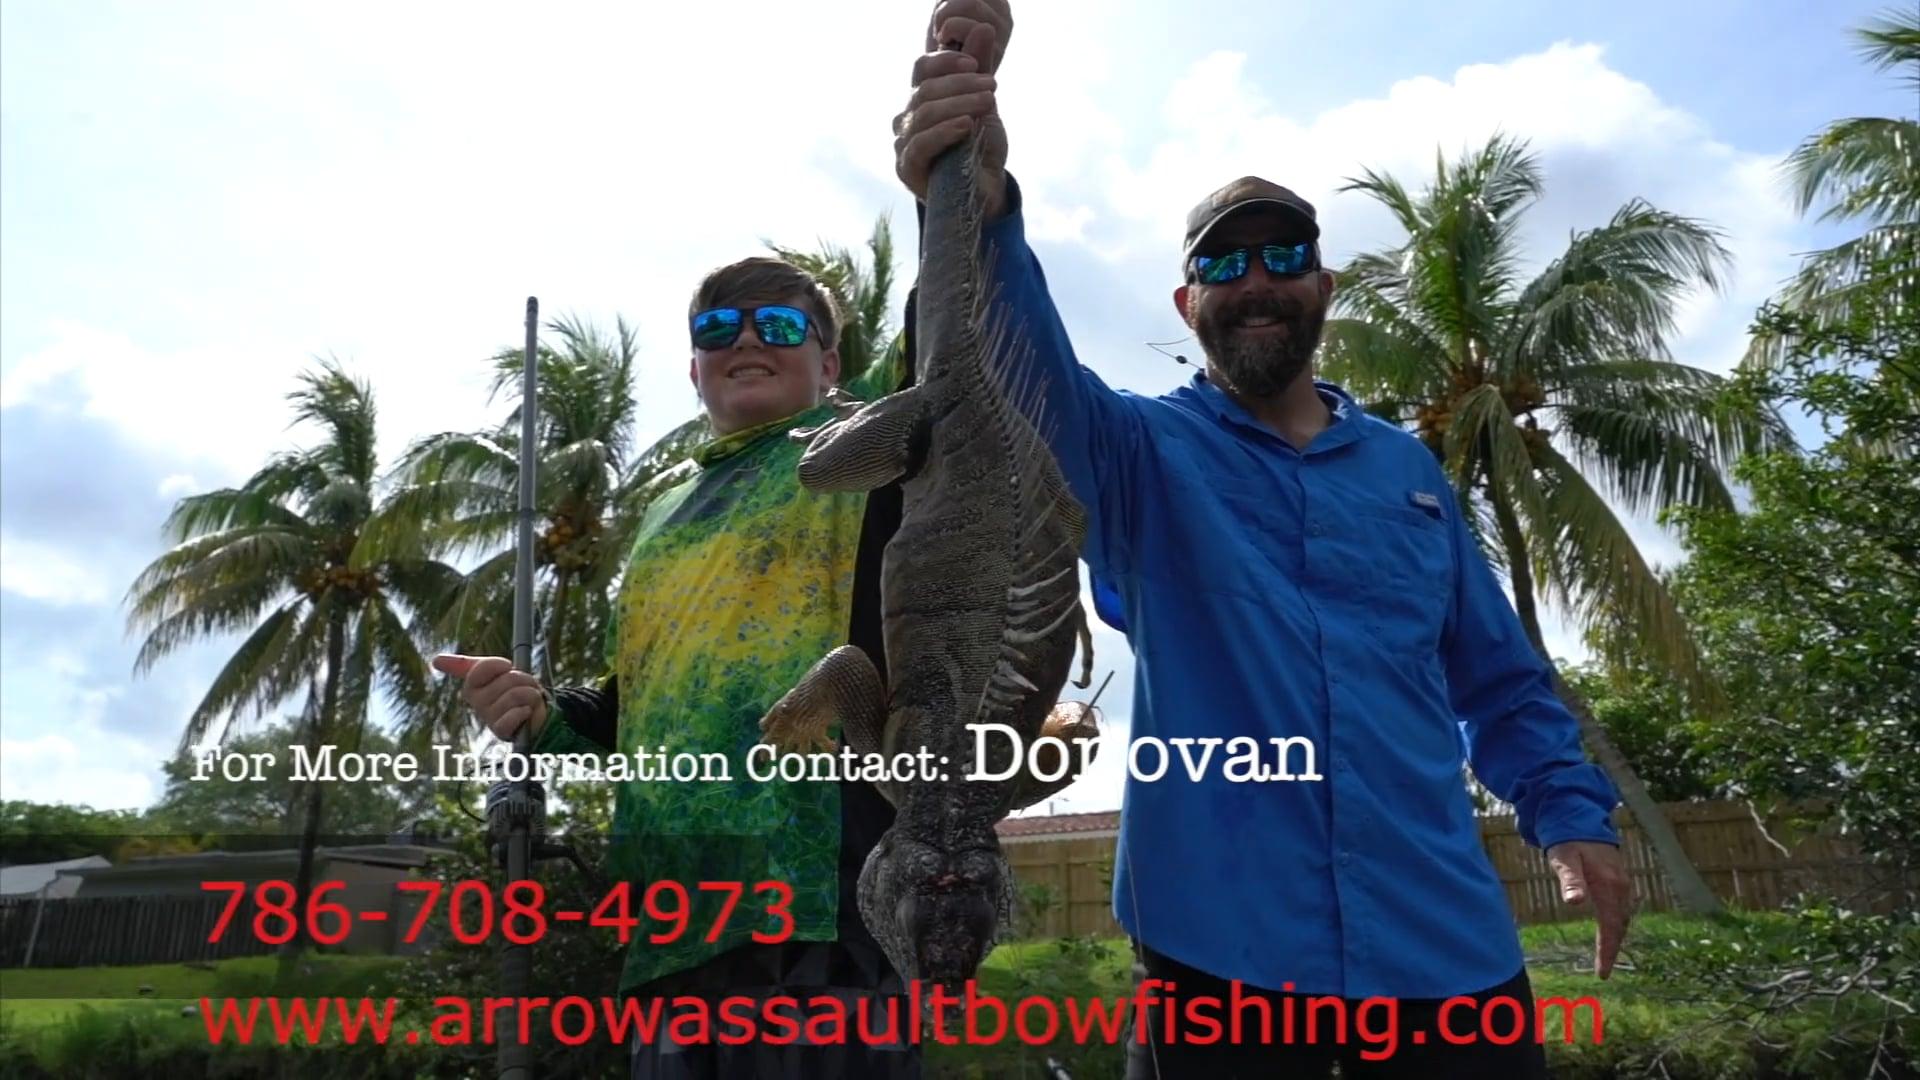 Arrow Assault Bowfishing